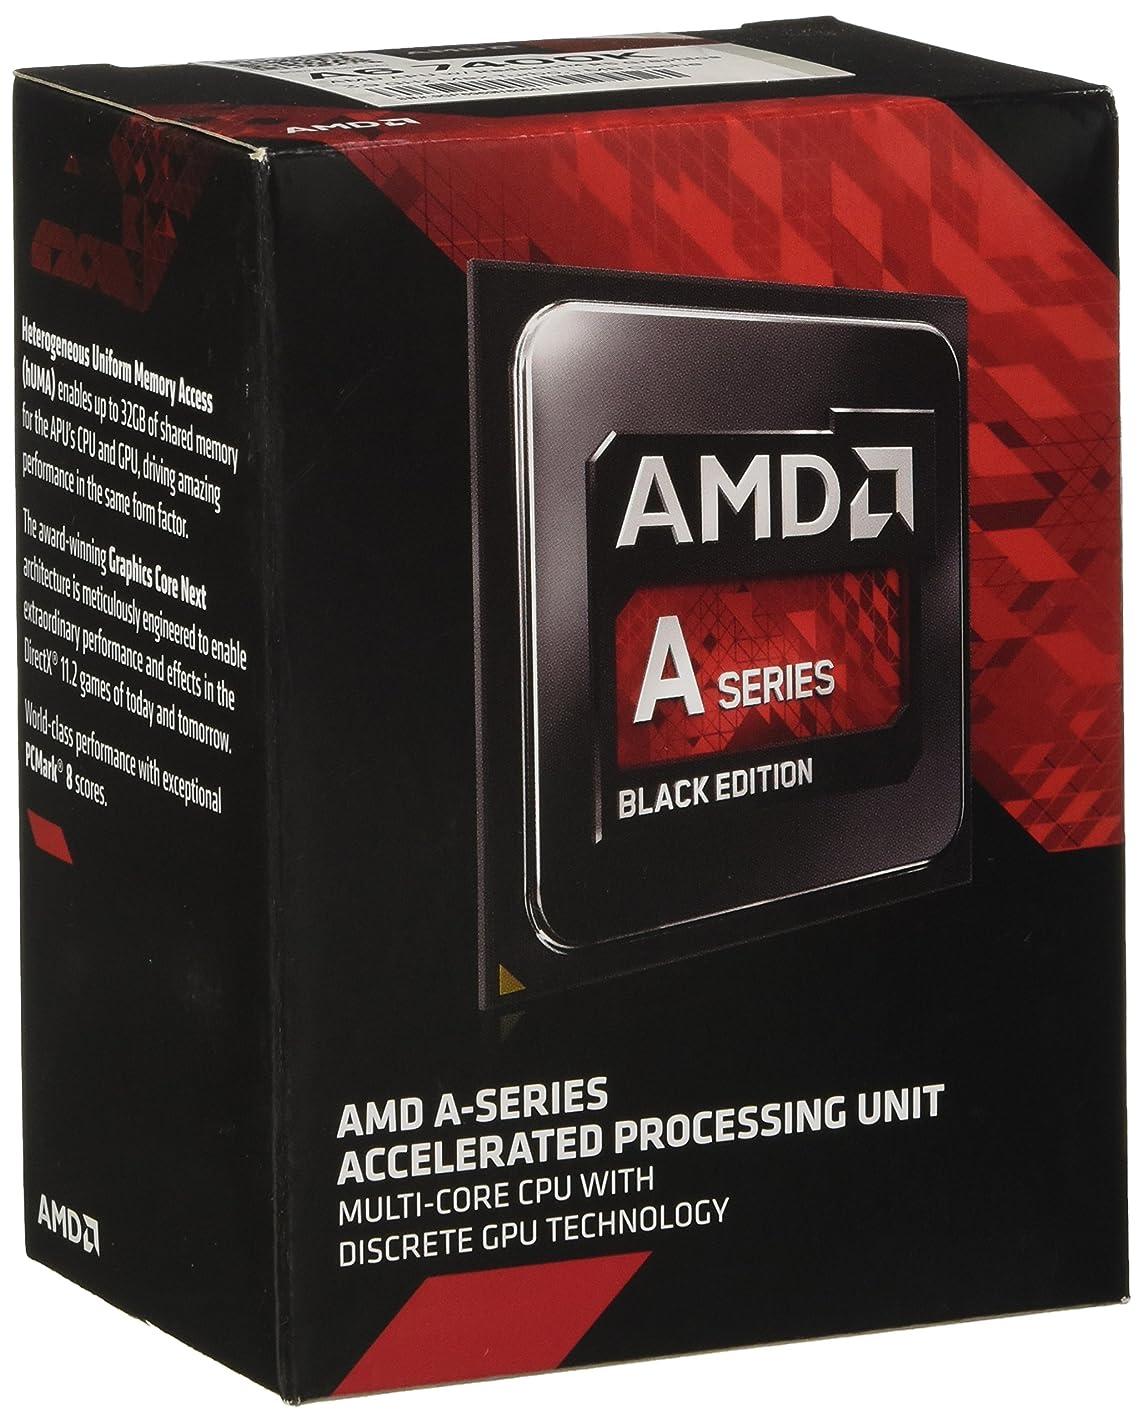 AMD AMD A6-7400K Dual-Core 3.5 GHz Socket FM2+ Desktop Processor Radeon R5 Series (AD740KYBJABOX) m12847640583